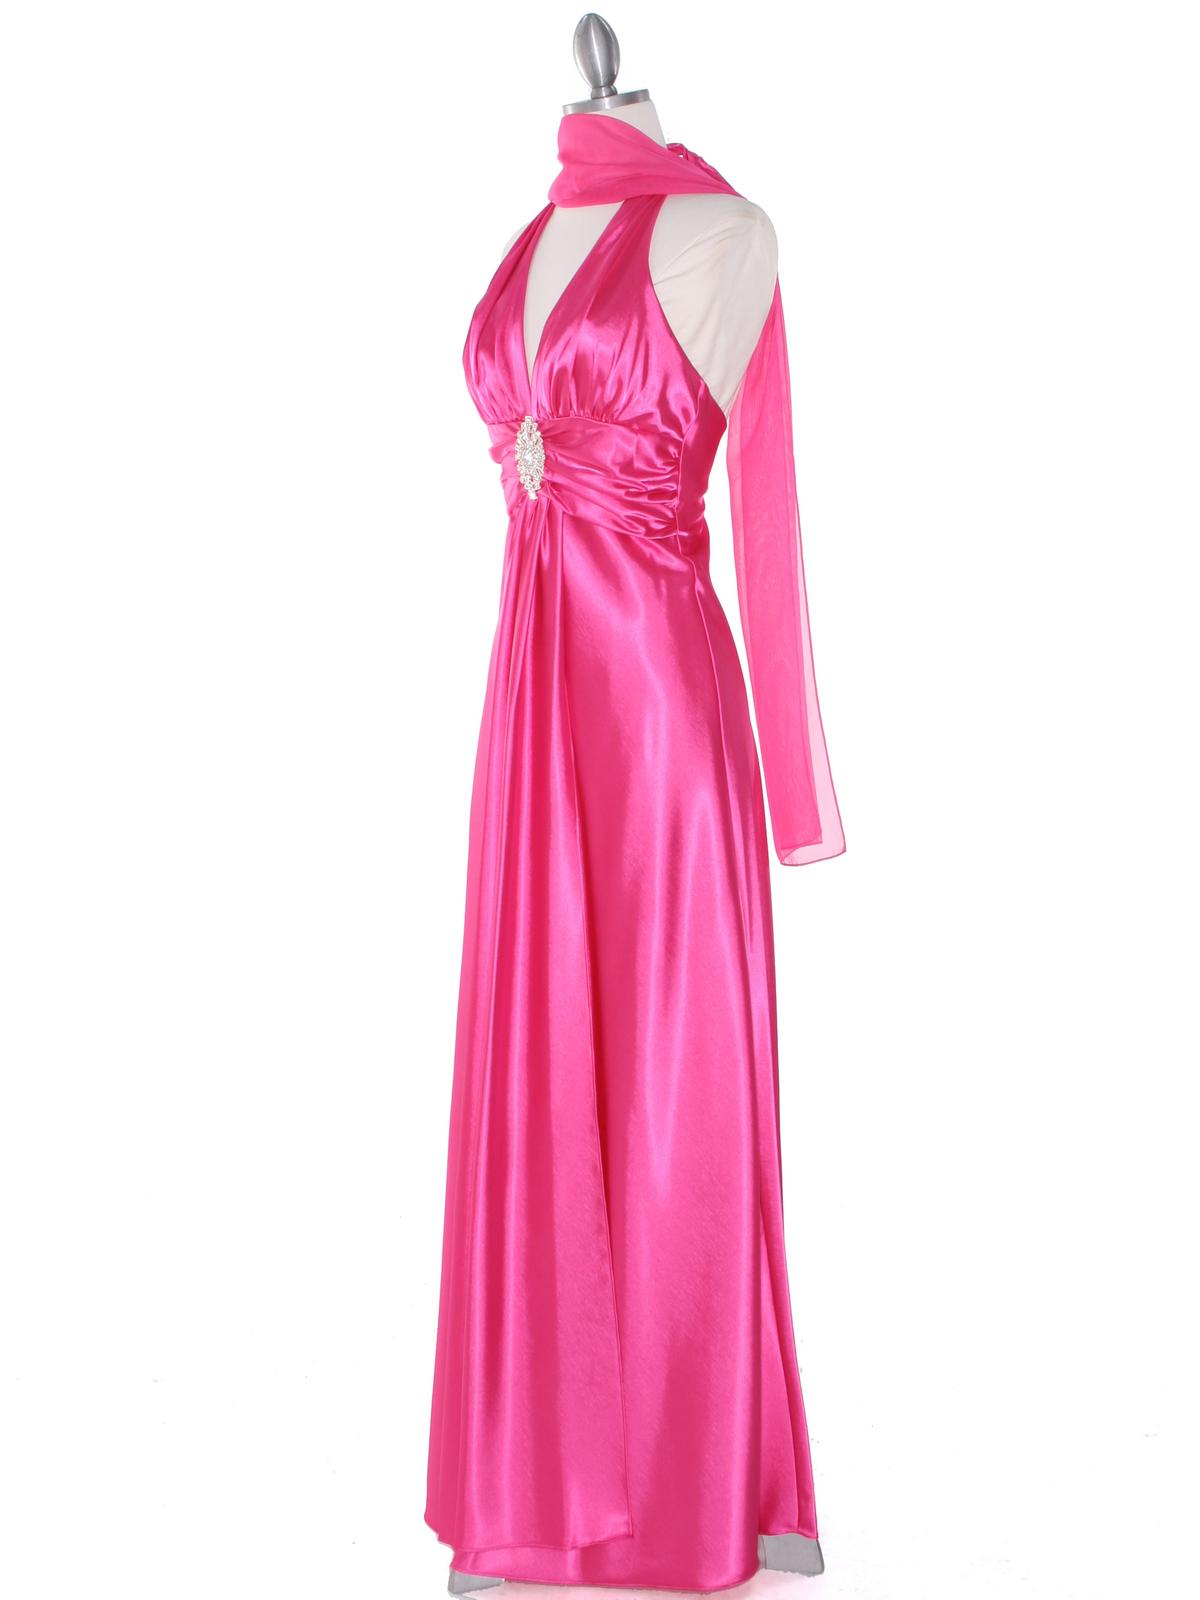 Hot Pink Satin Halter Prom Dress Sung Boutique L A